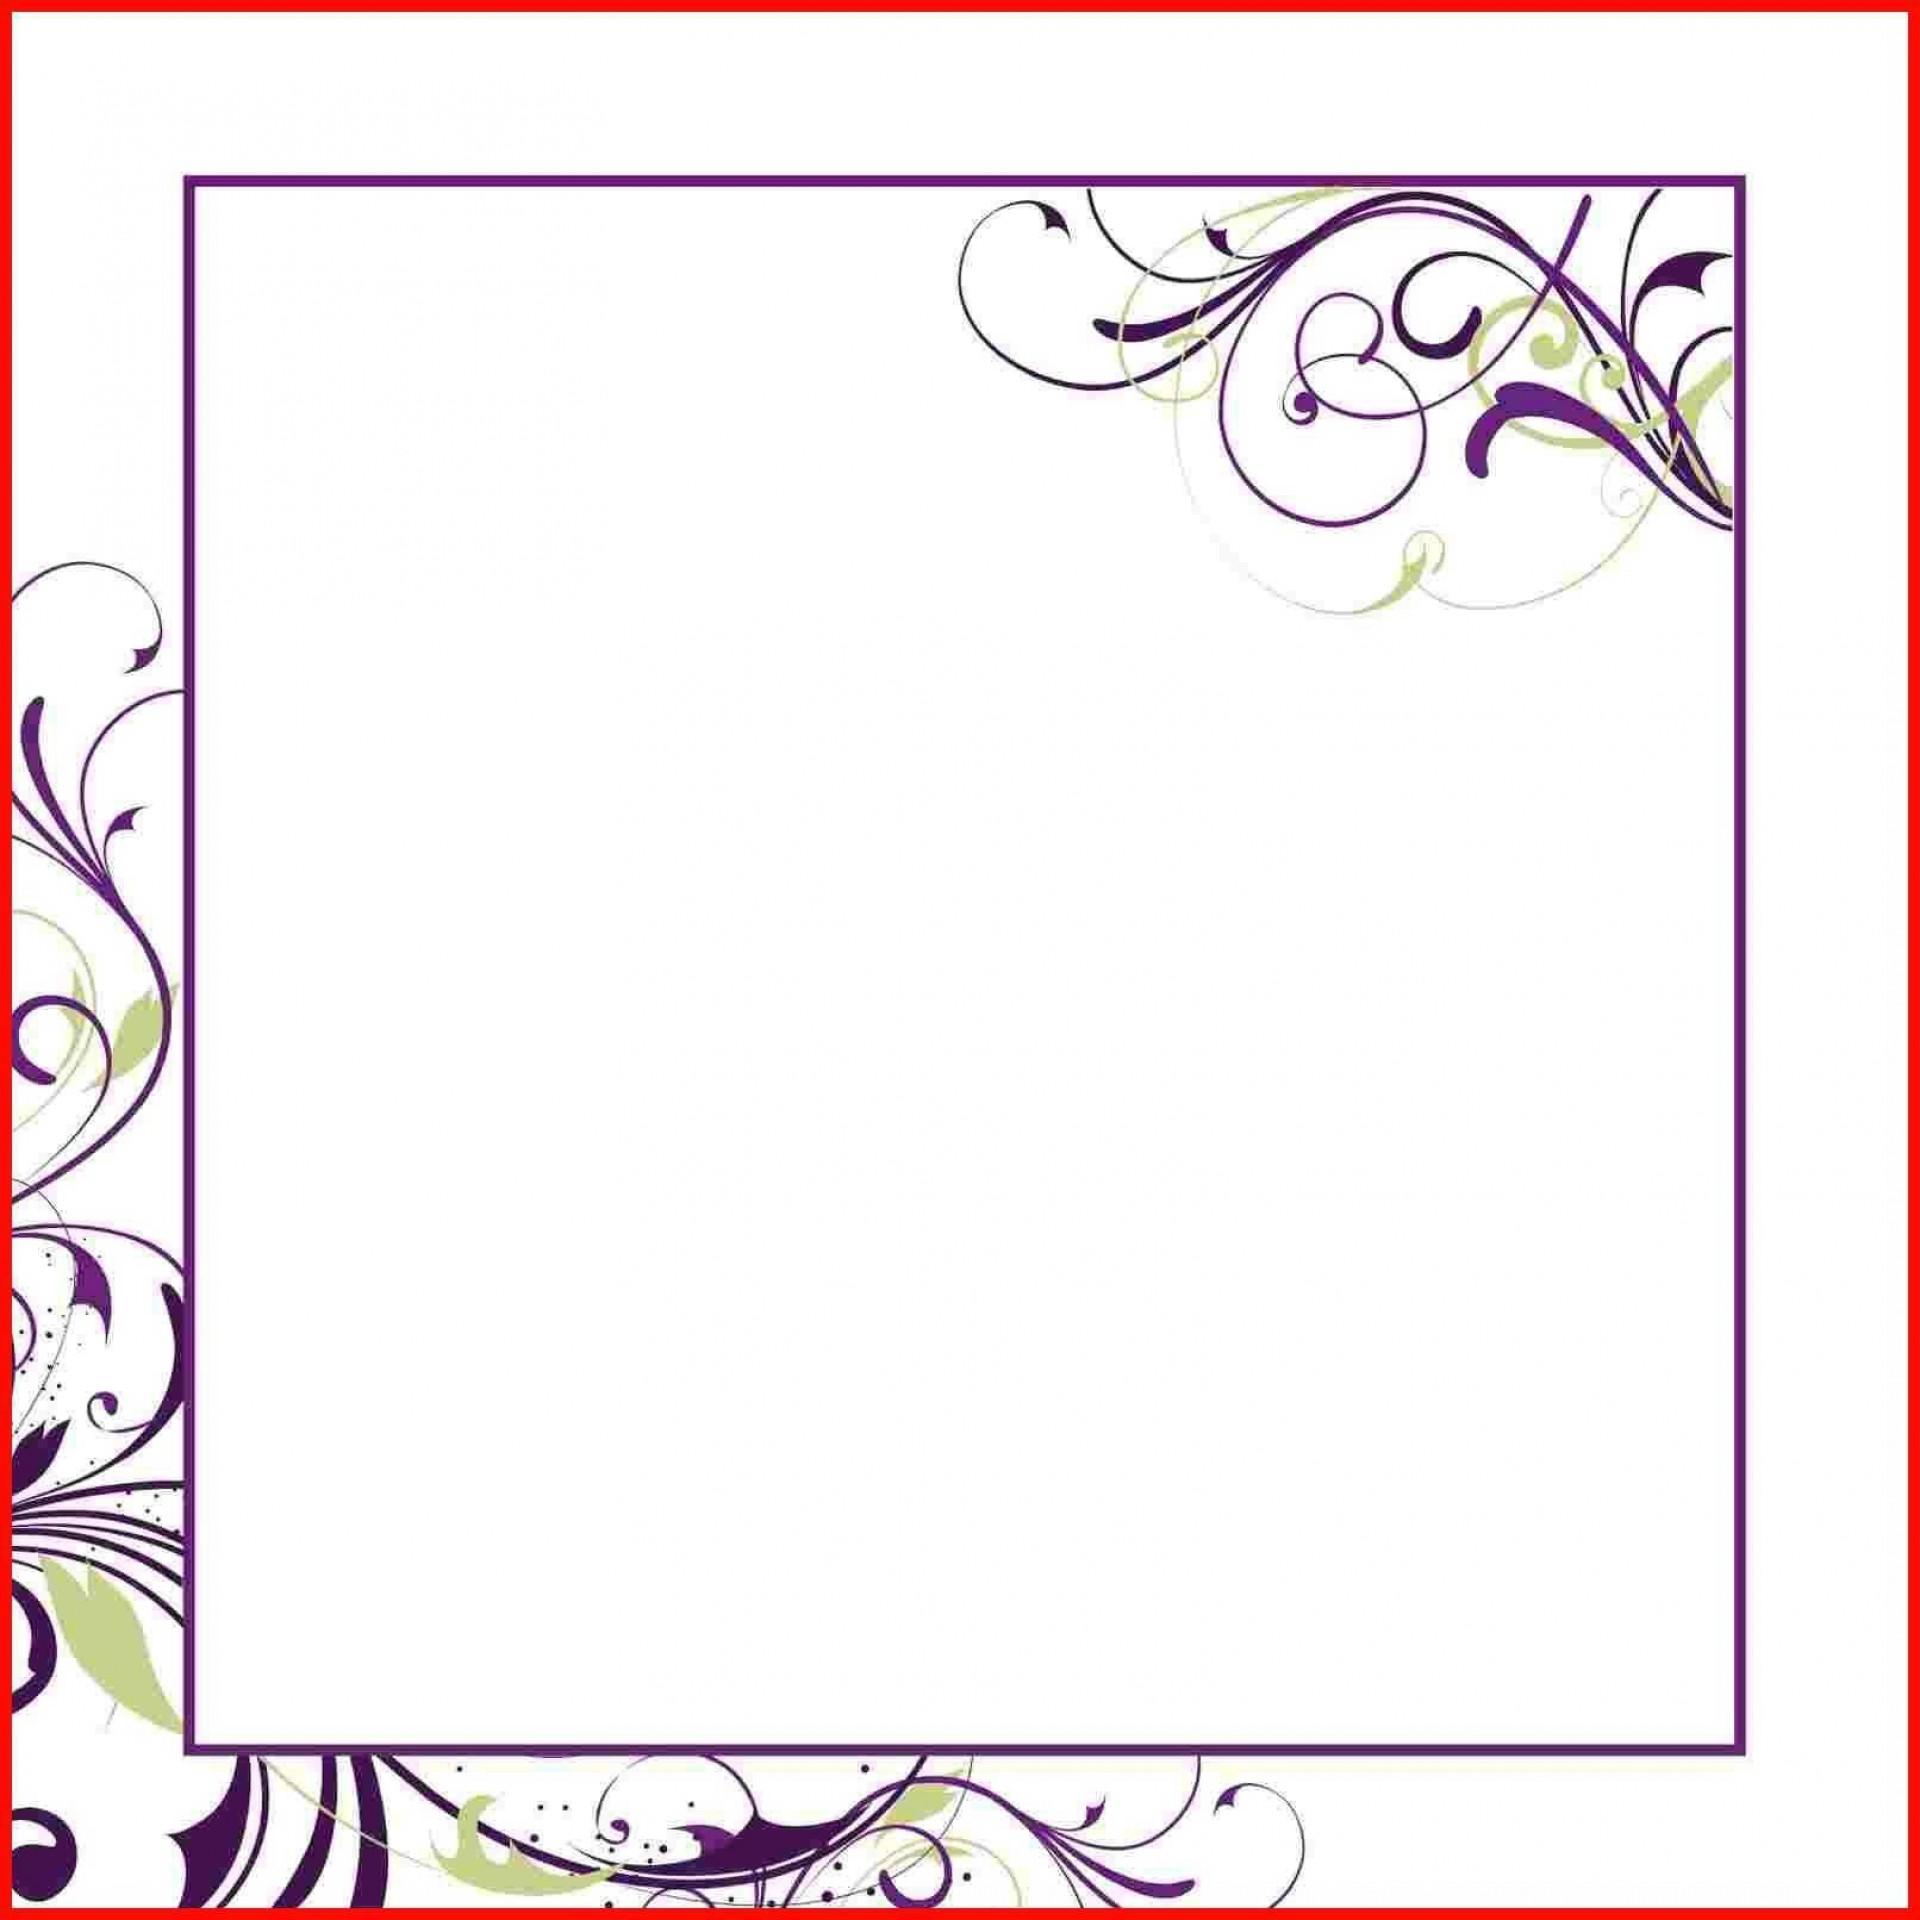 003 Breathtaking Microsoft Word Wedding Invitation Template Free Download Sample  M Editable1920